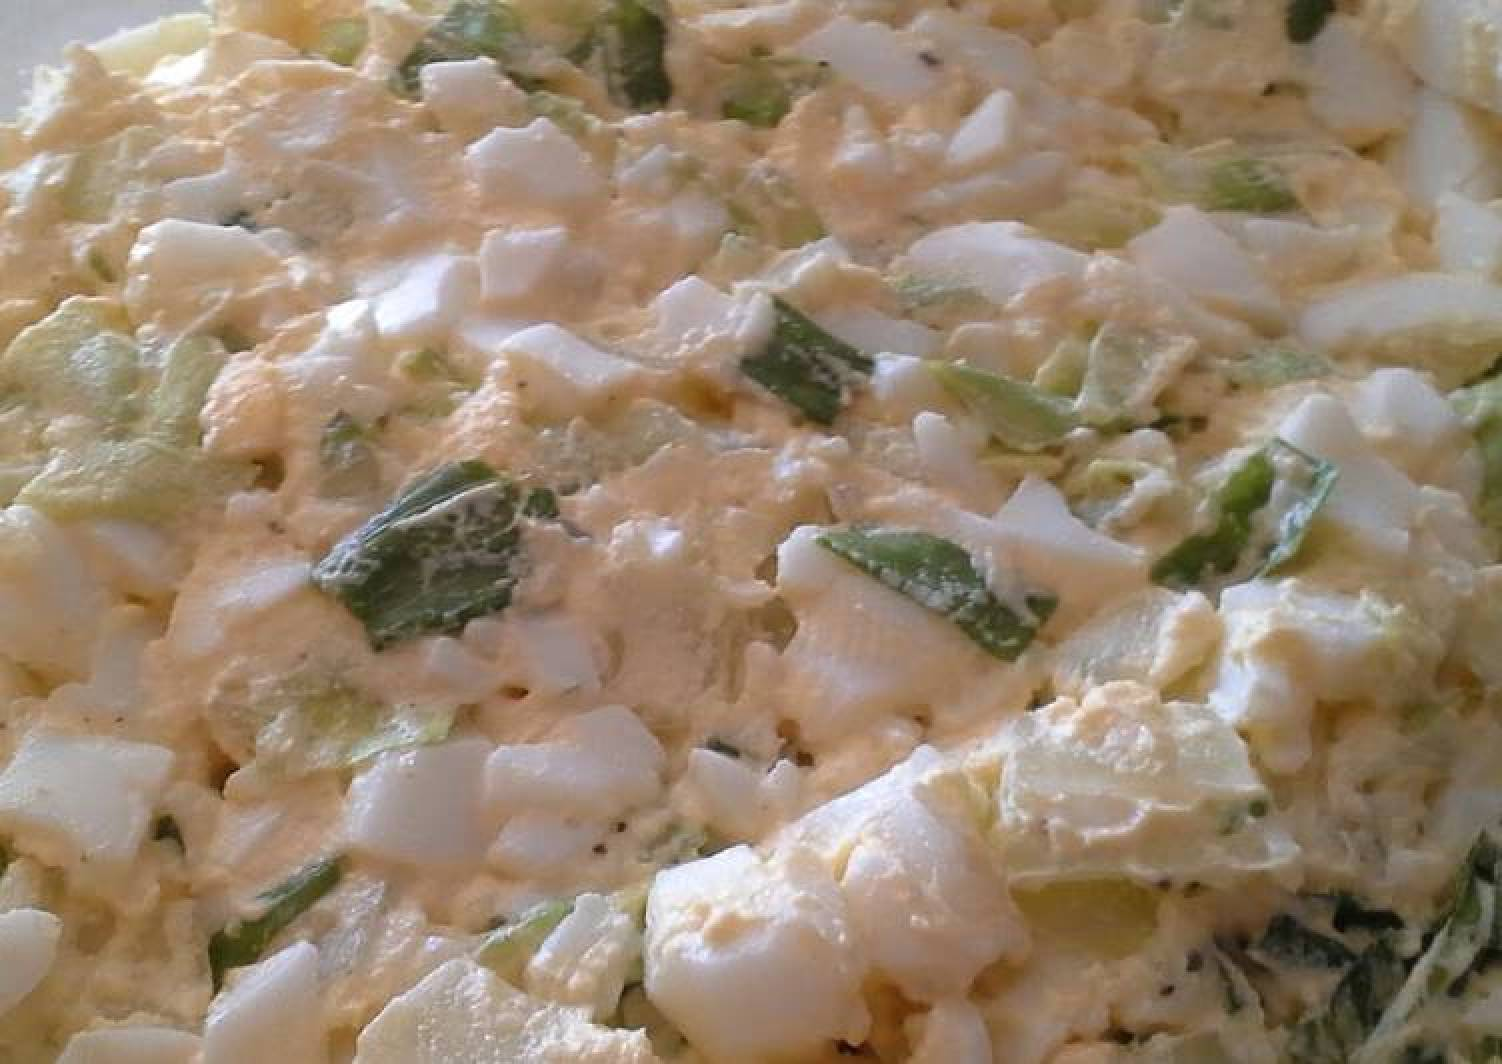 Lettuce & Egg Salad